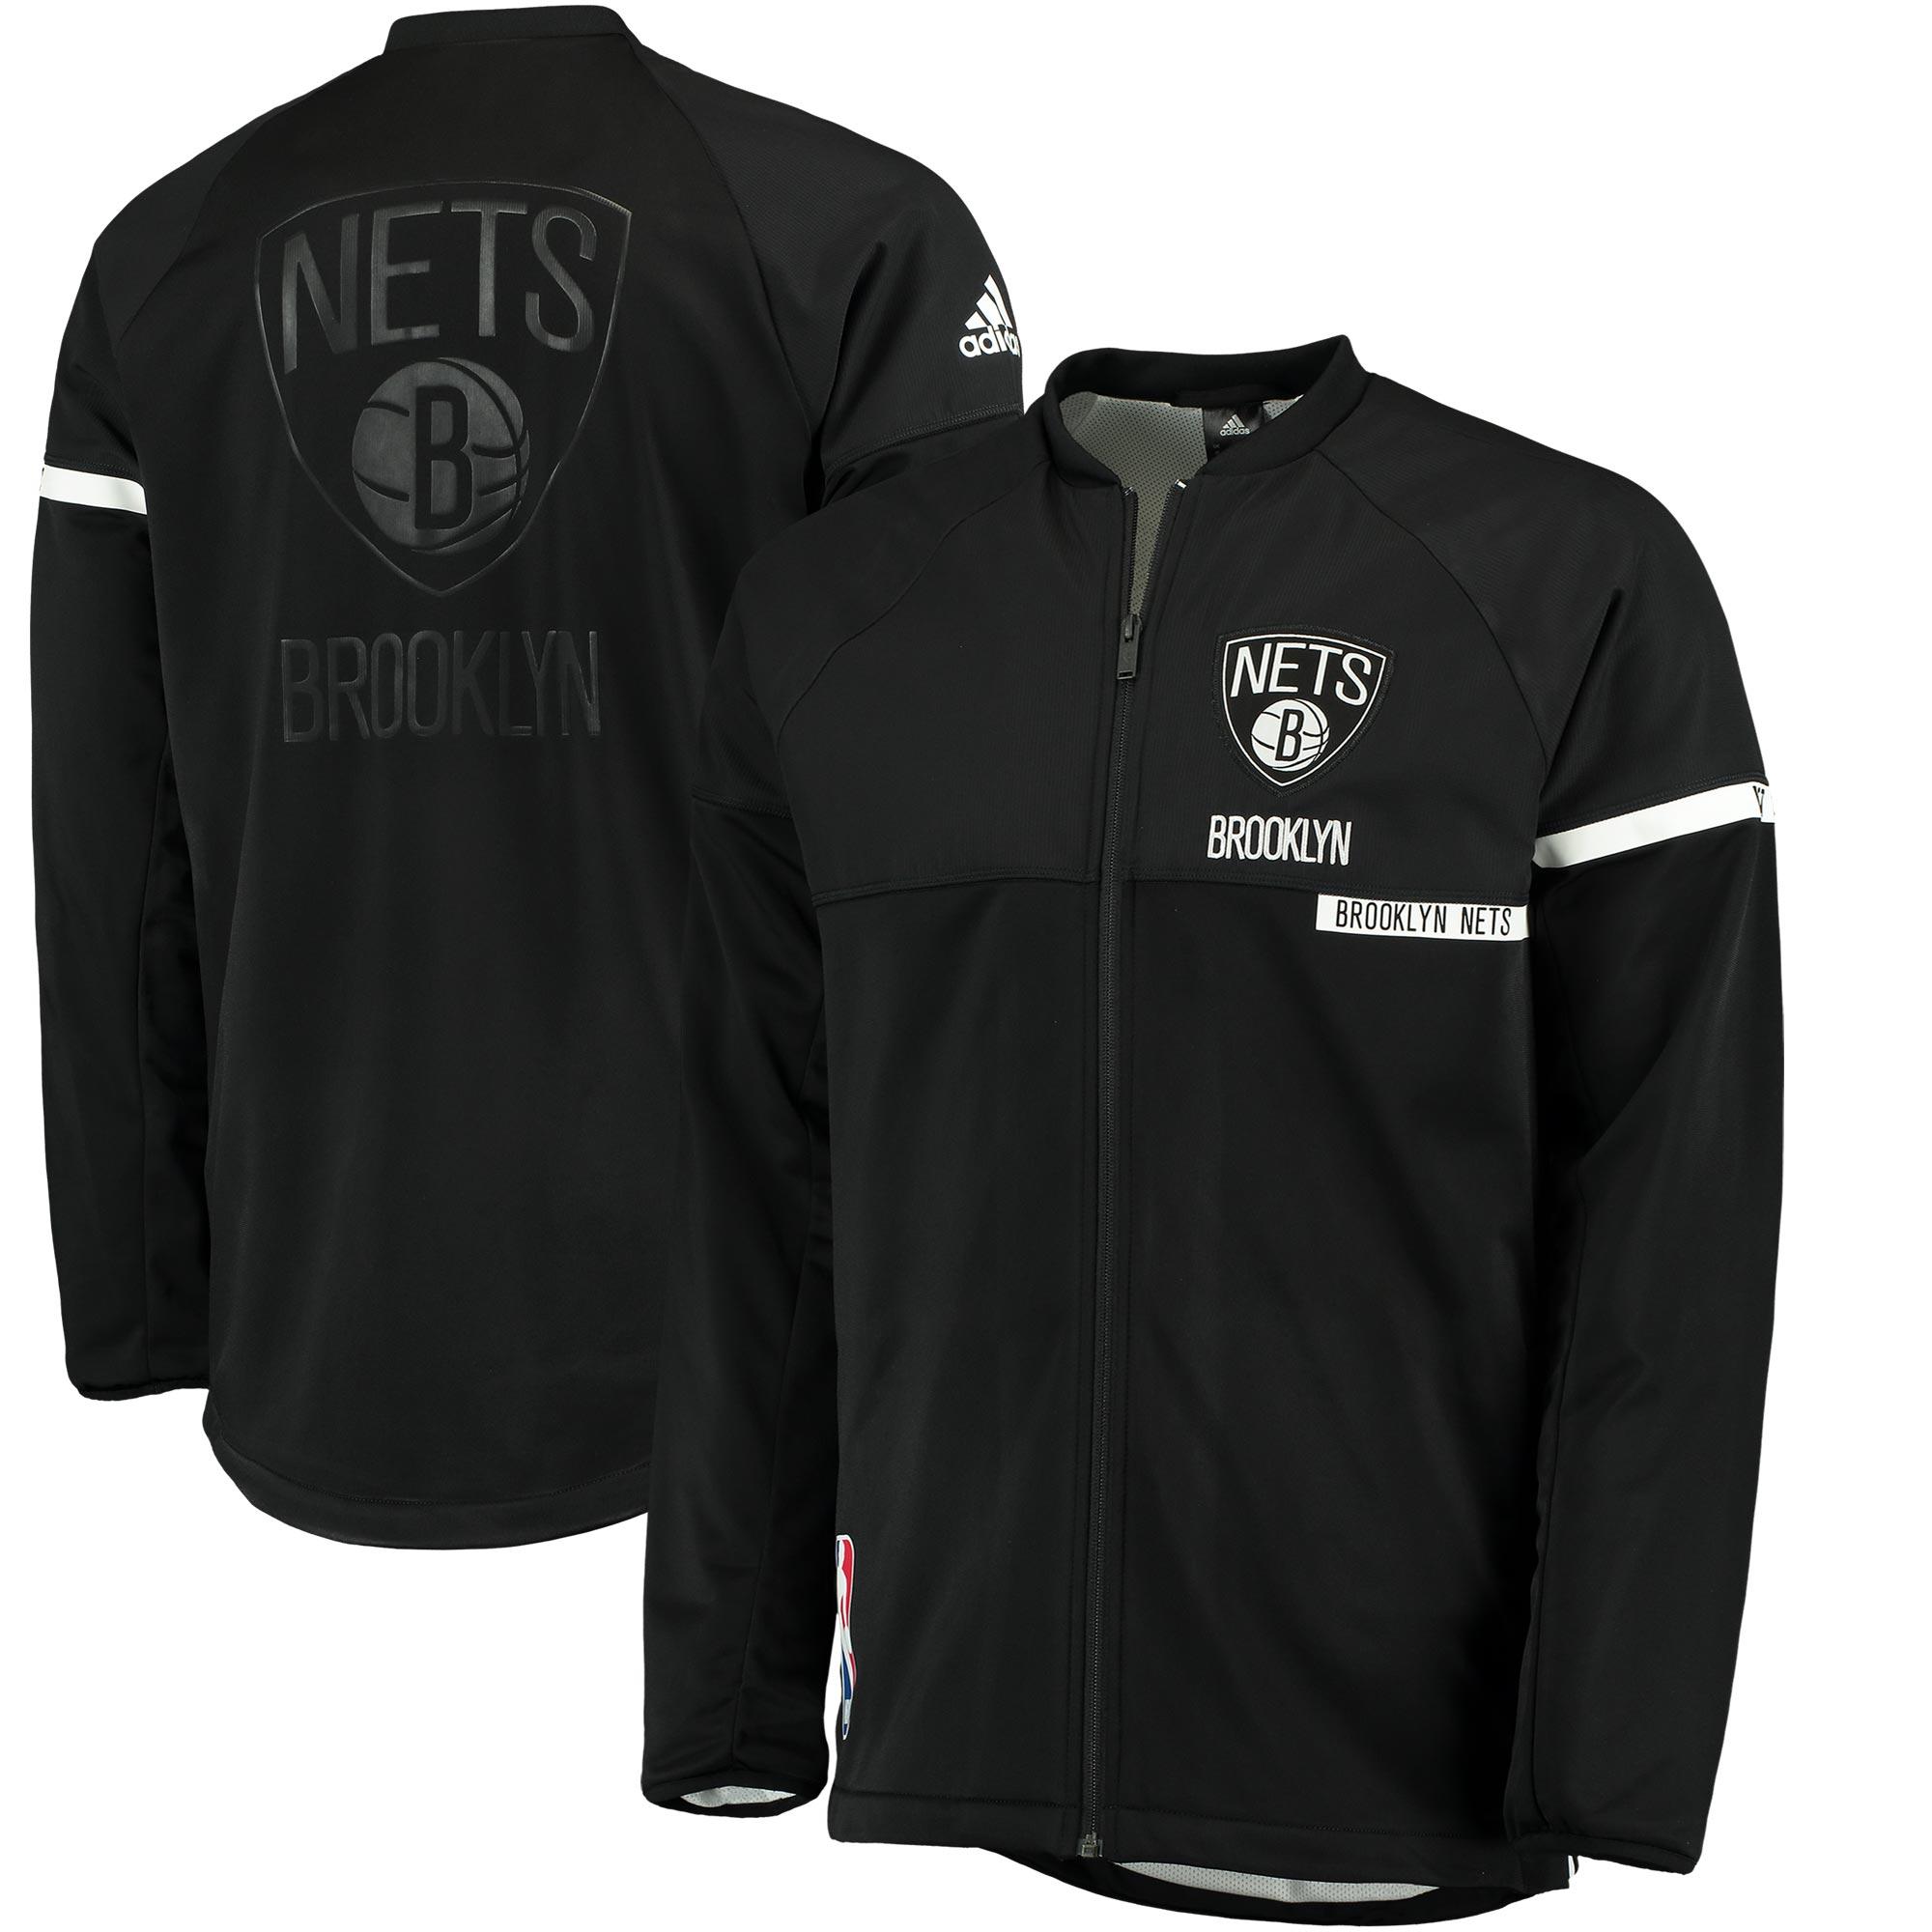 Brooklyn Nets adidas 2016 On-Court Jacket - Black